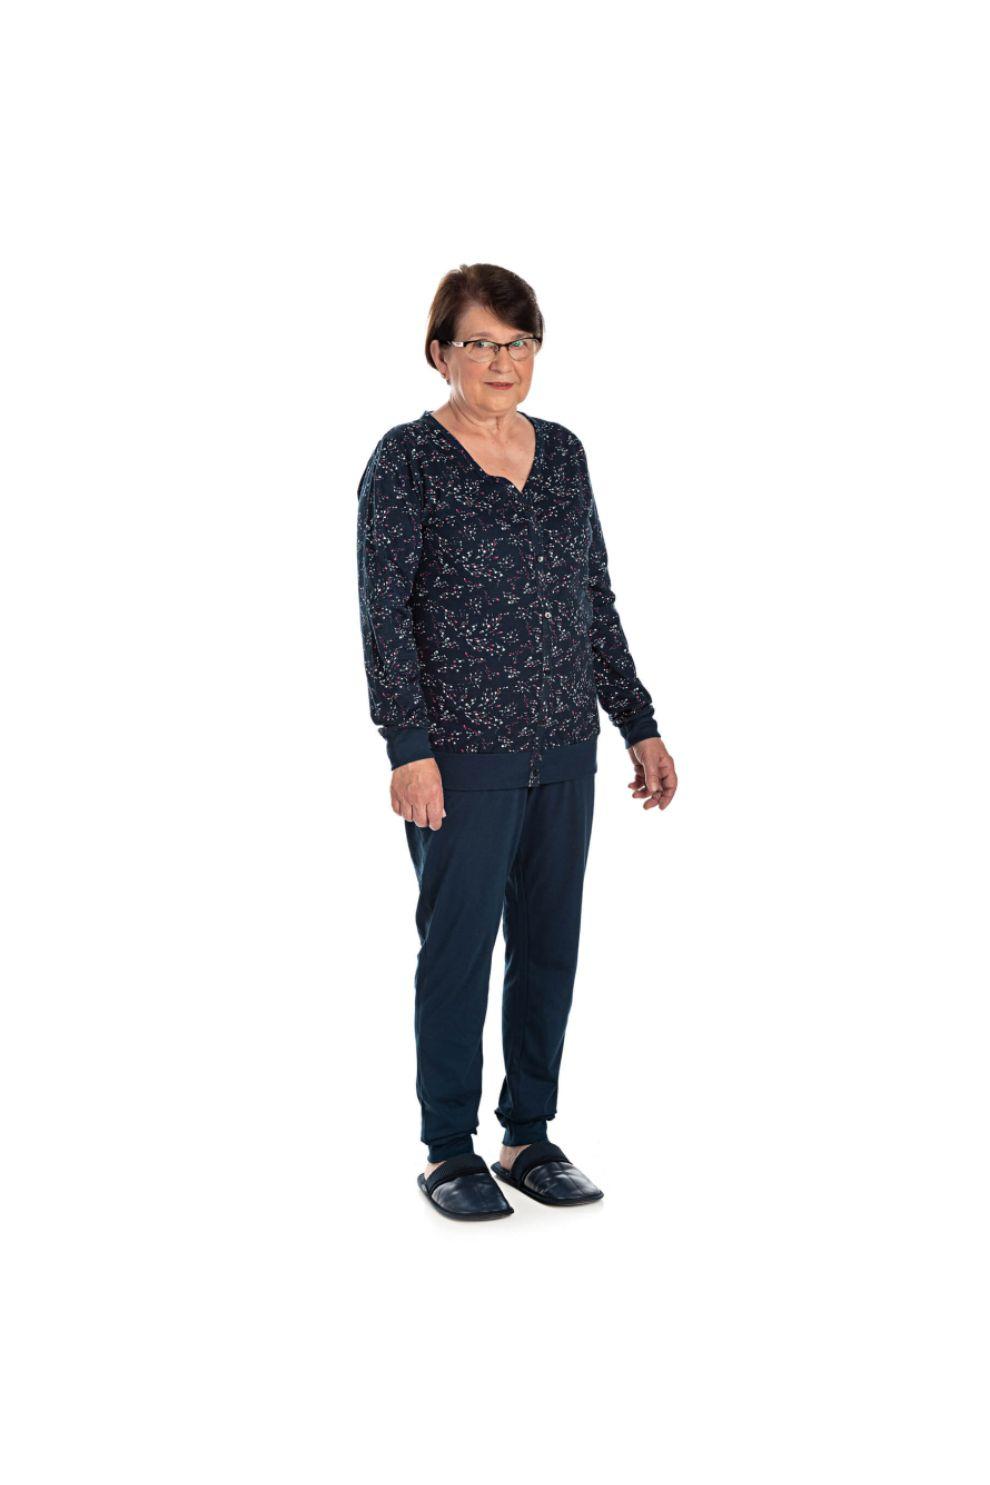 013/E - Pijama Adulto Feminino Estampa Rotativa